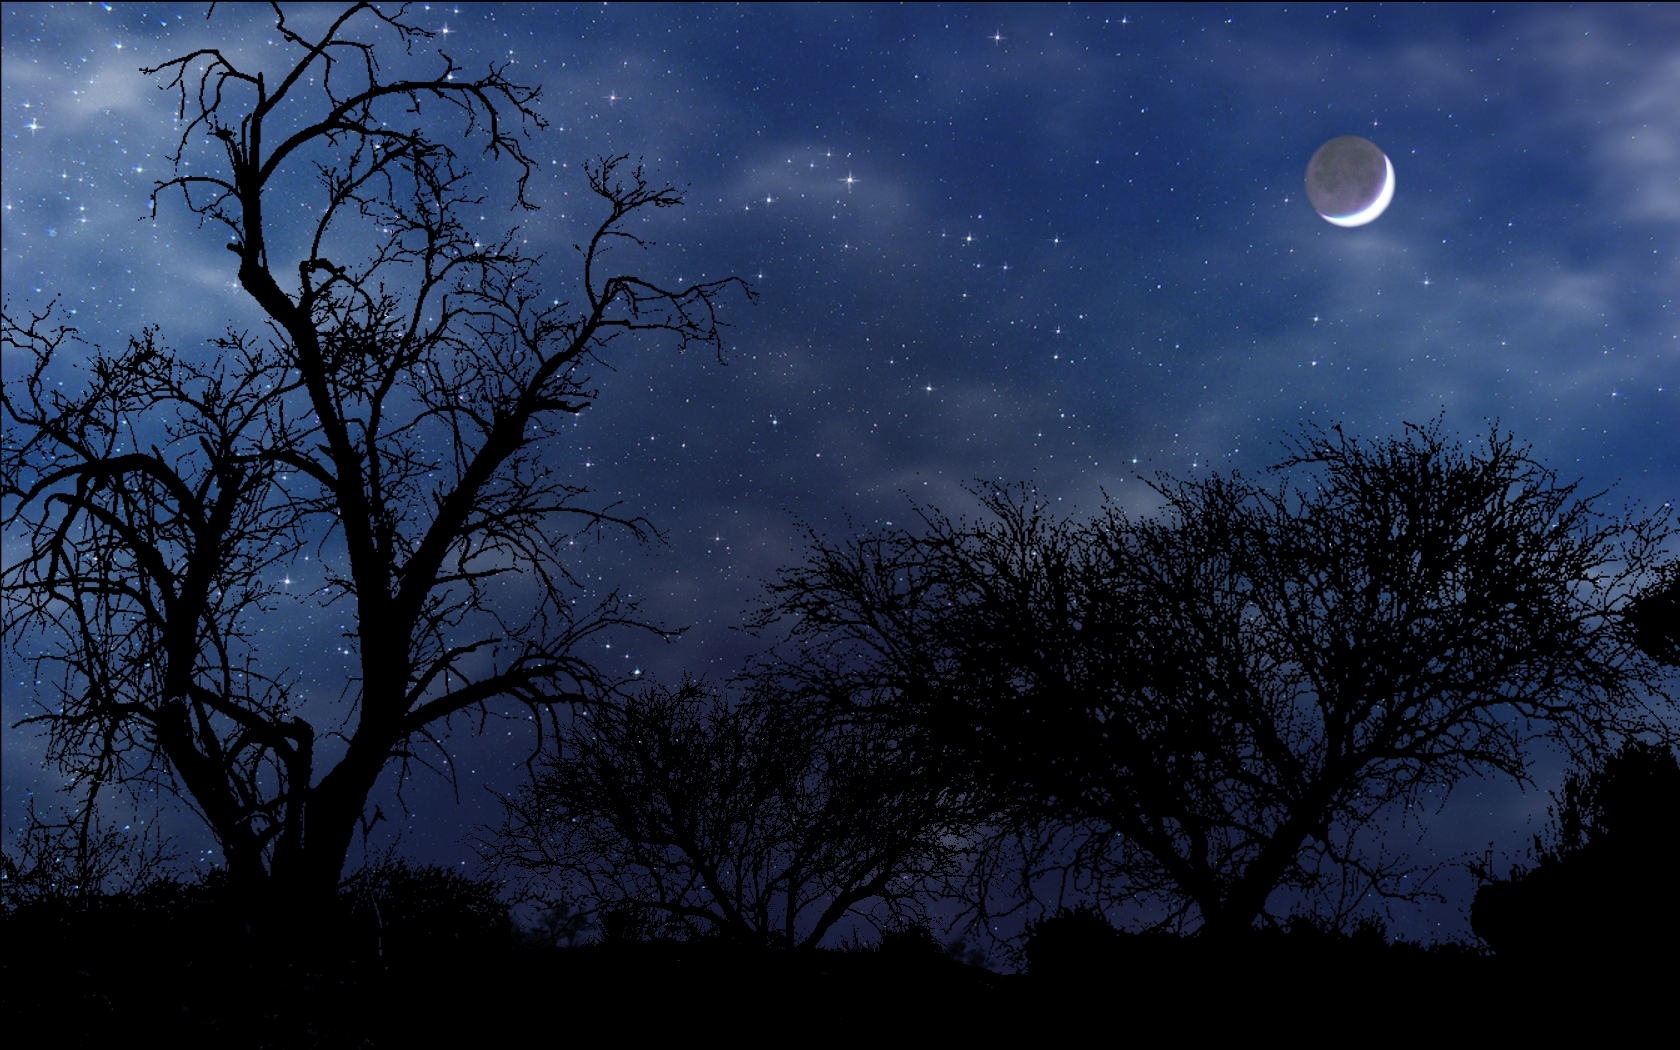 Wallpaper download night - Night Scenes Wallpaper